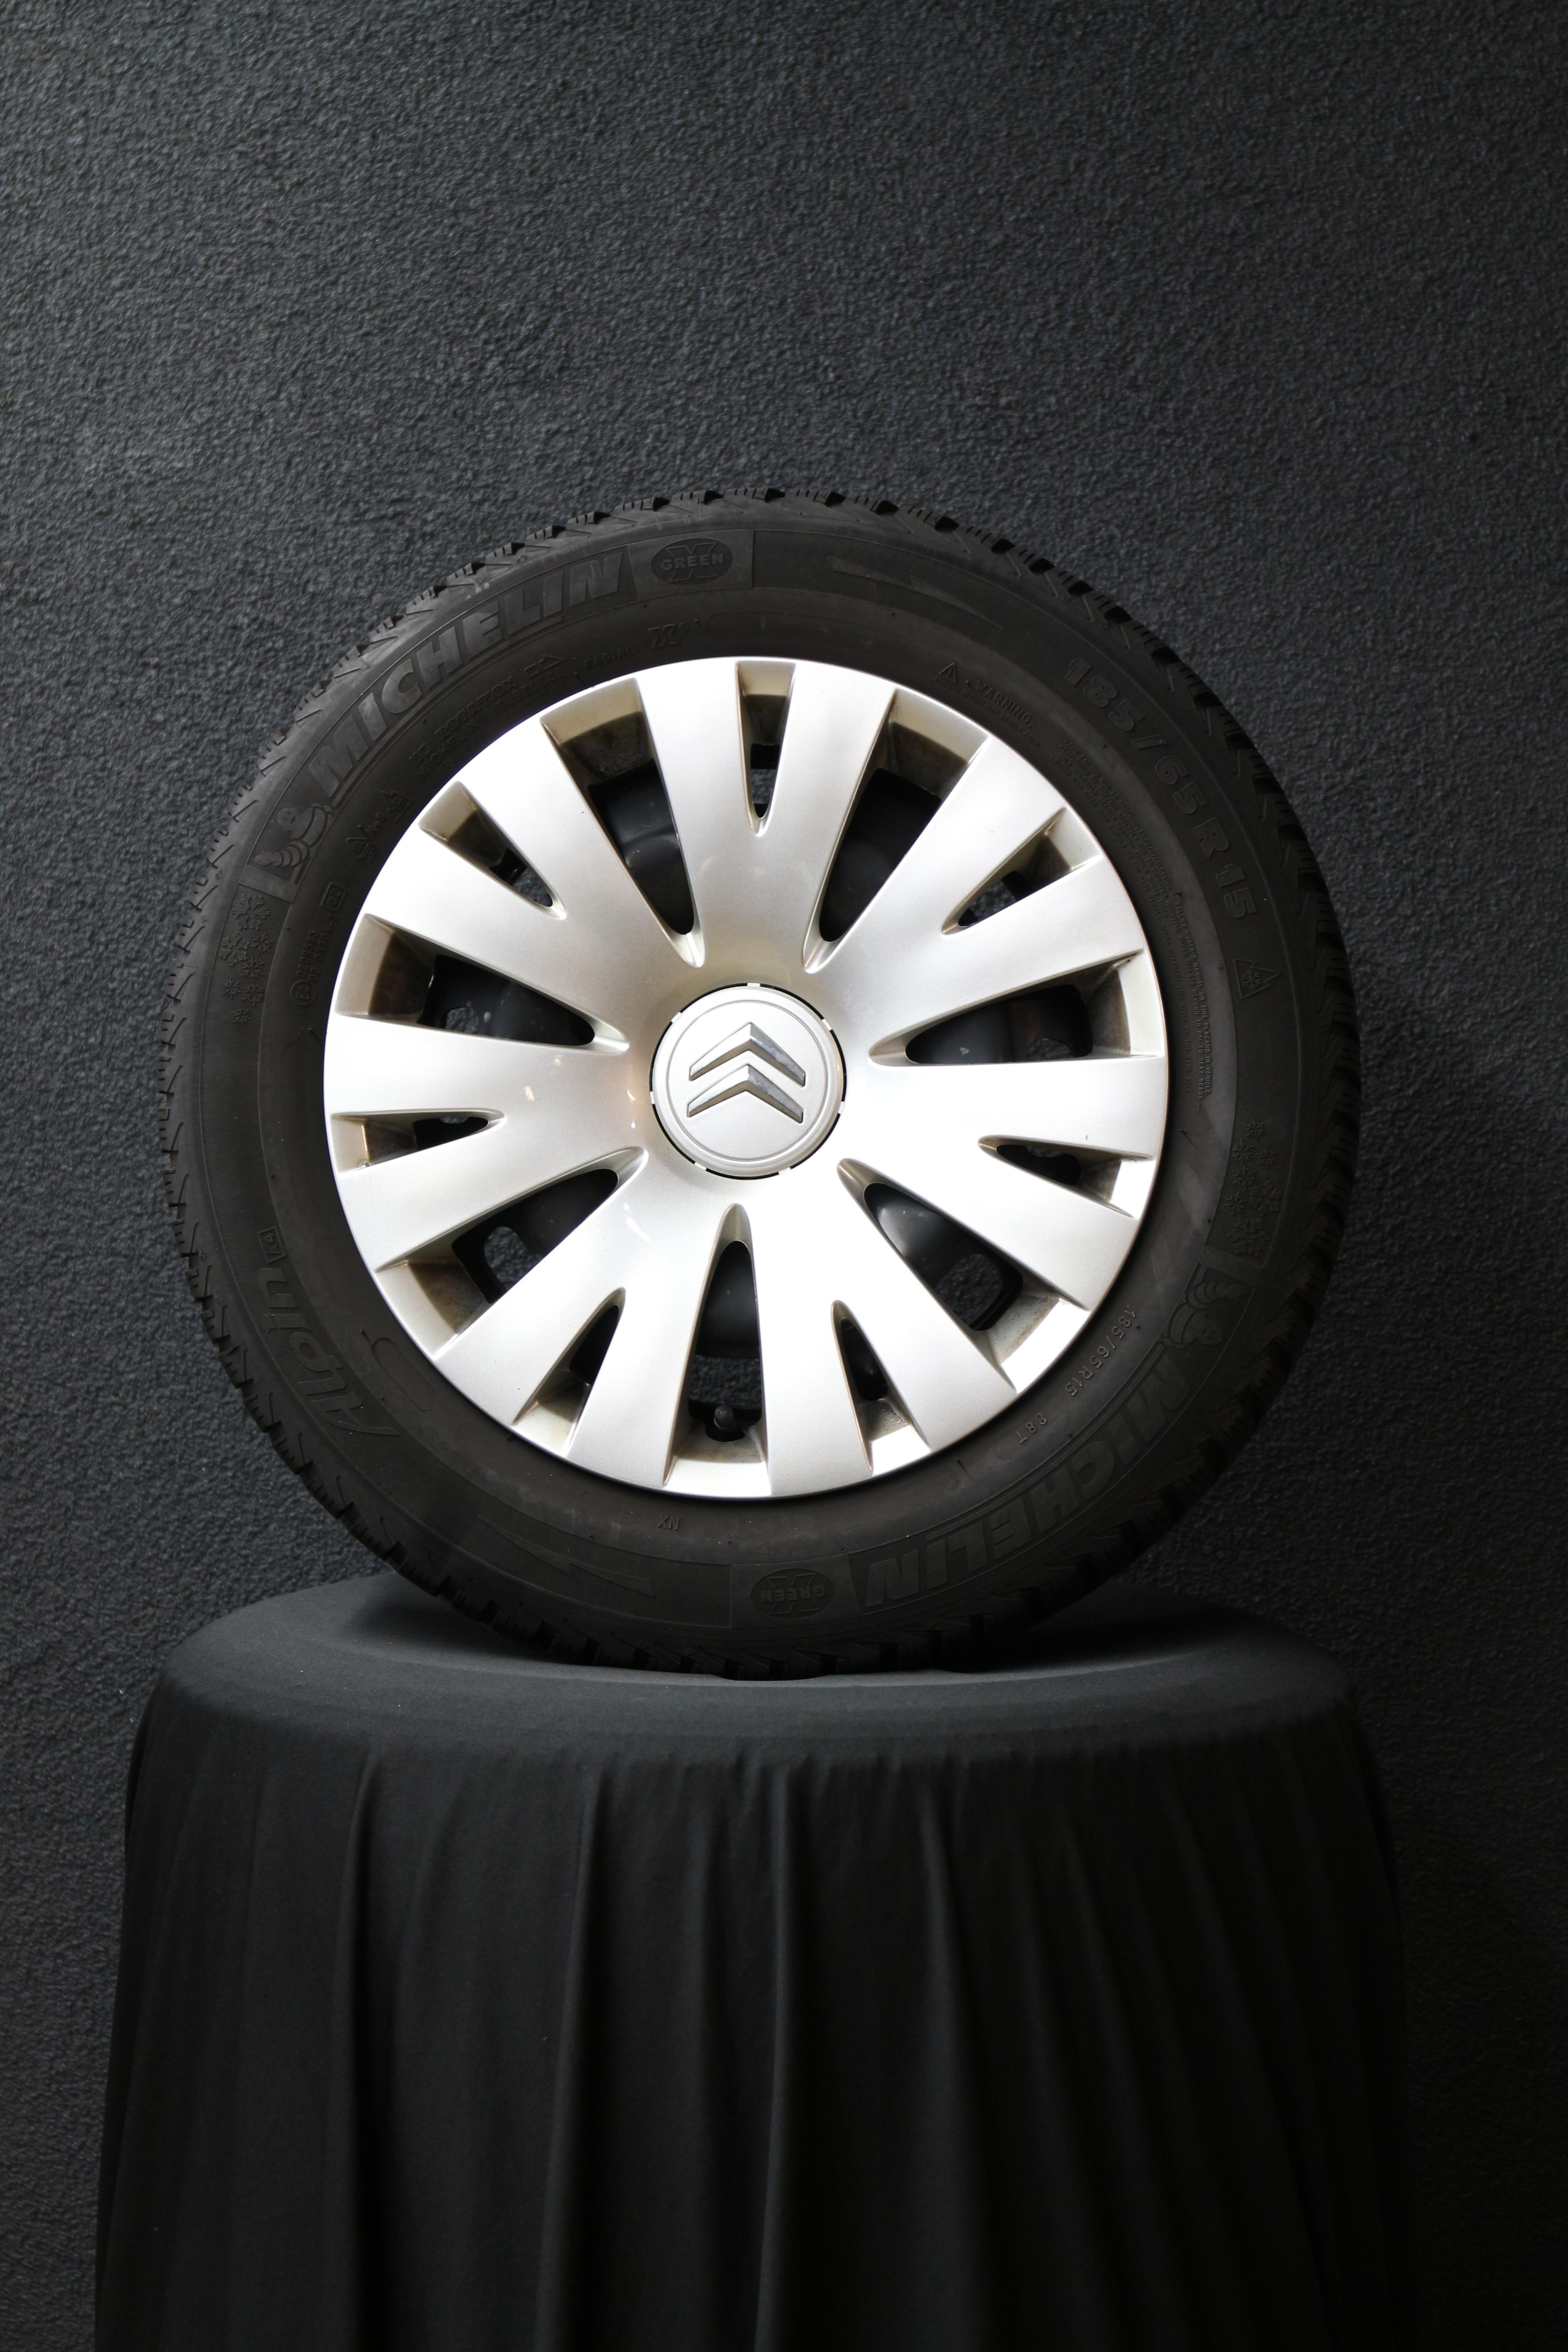 Stalen Wielen Citroën Berlingo Abc Banden Banden